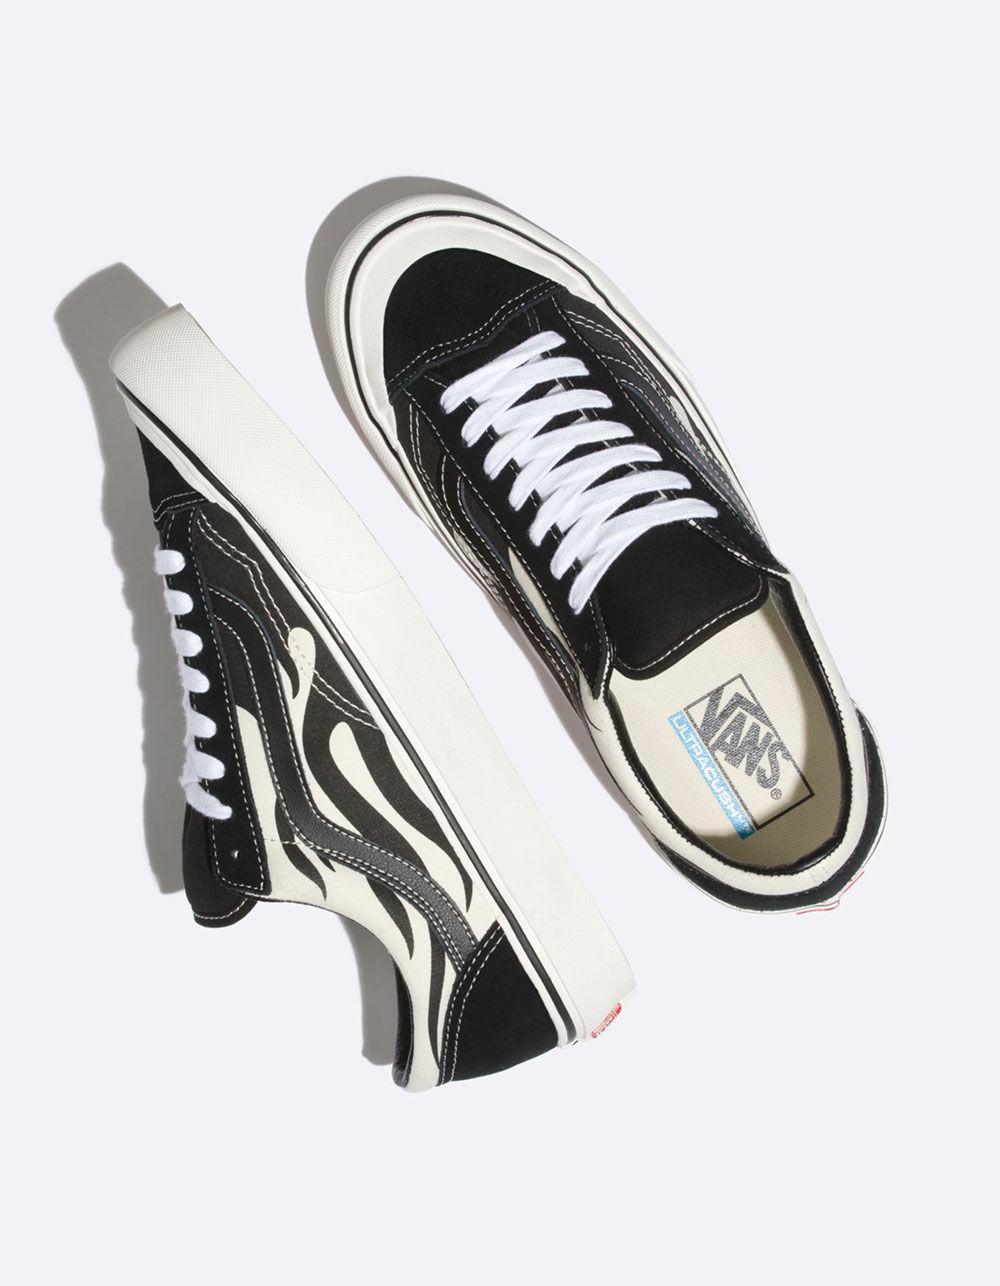 4c1c155ee1d6 Lyst - Vans Style 36 St Flame Mens Shoes in Black for Men